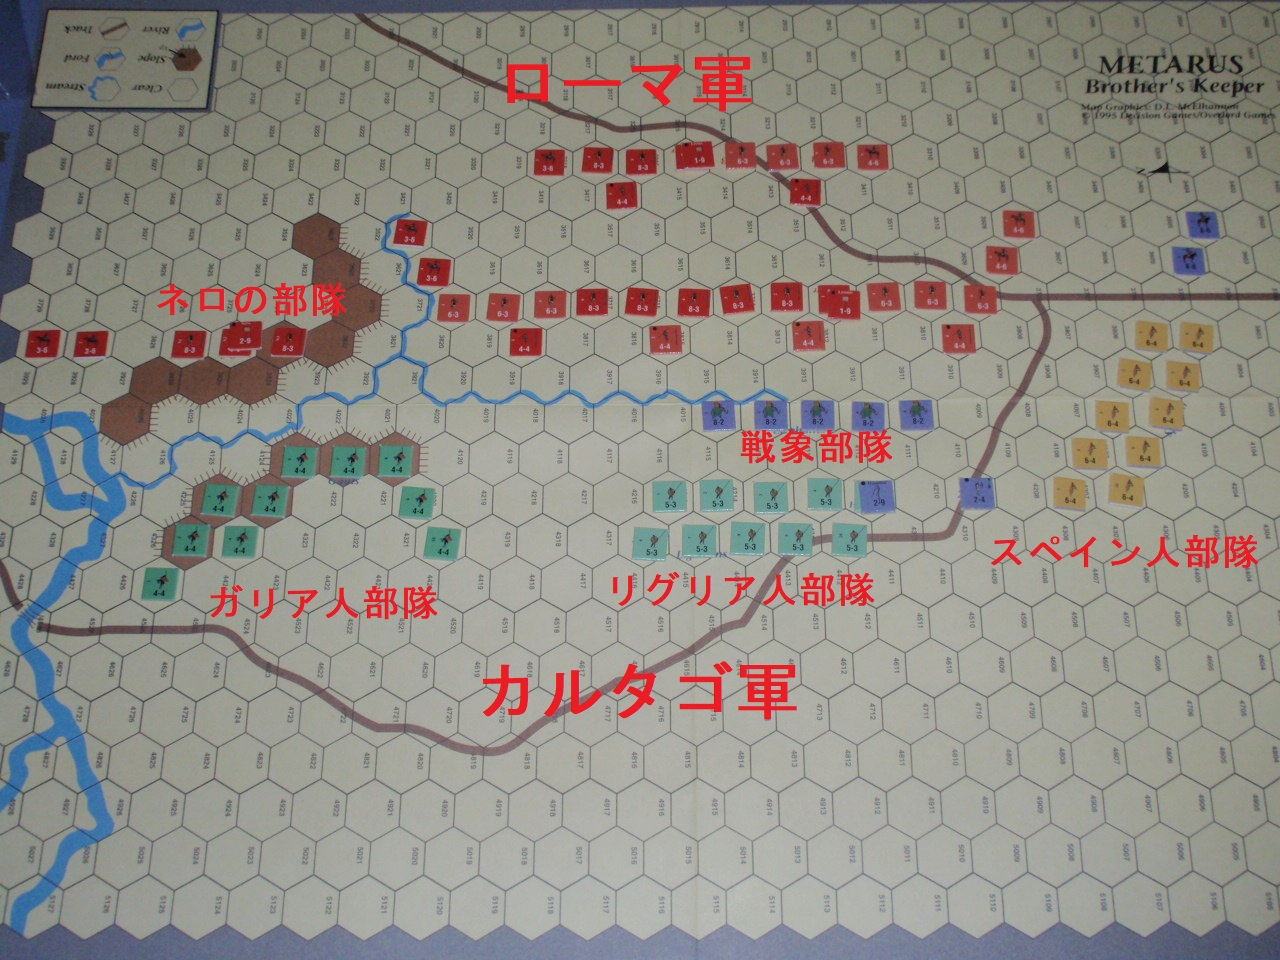 DG「Battles of the Ancient World」シリーズから「Metauras 207B.C.」をソロプレイ①_b0162202_19424052.jpg